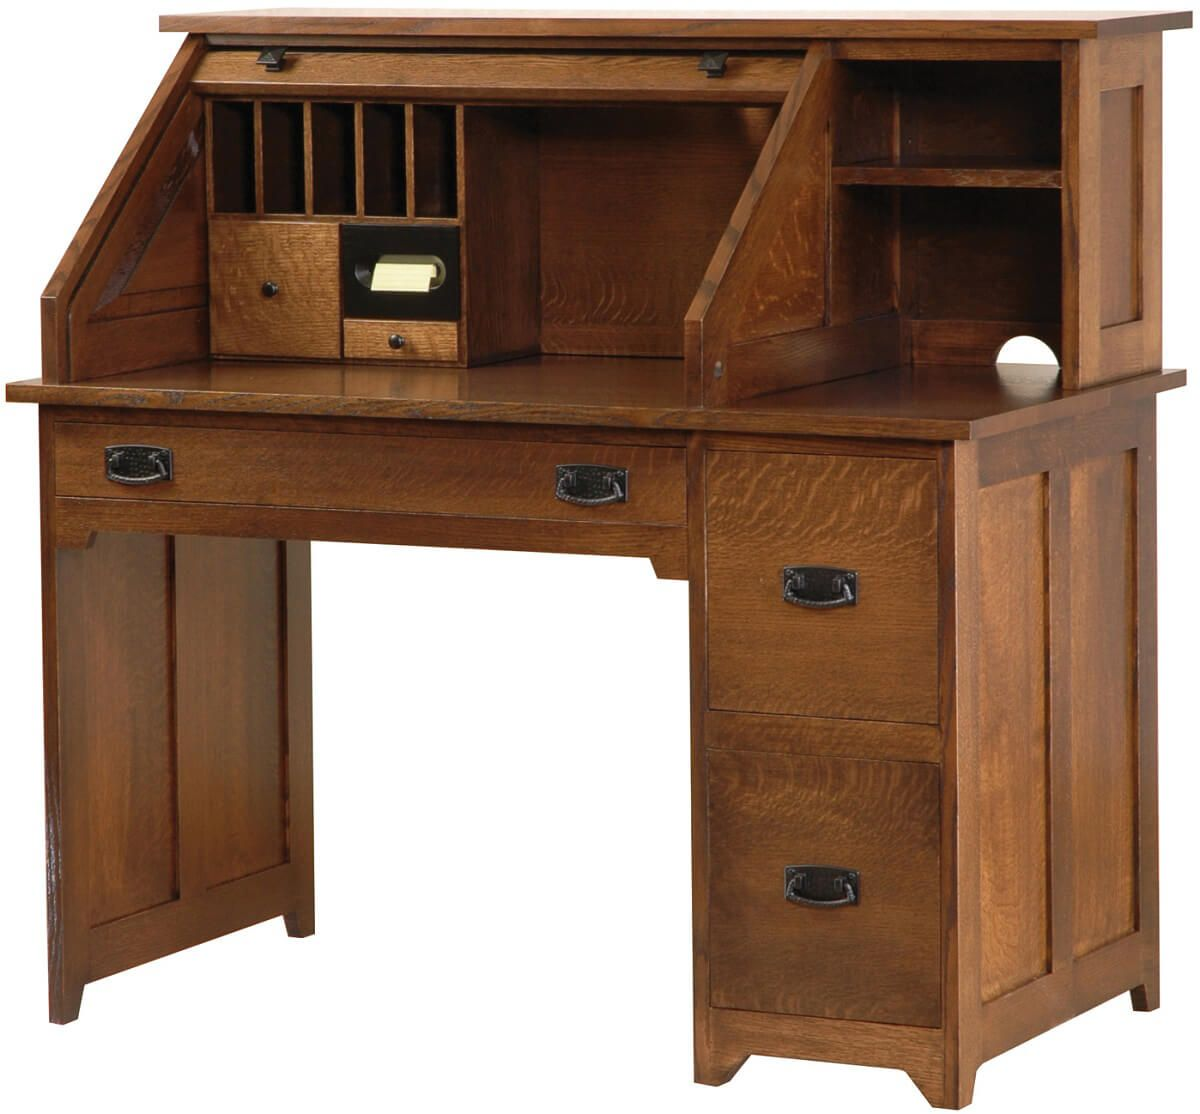 Homesteader's Roll Top Desk